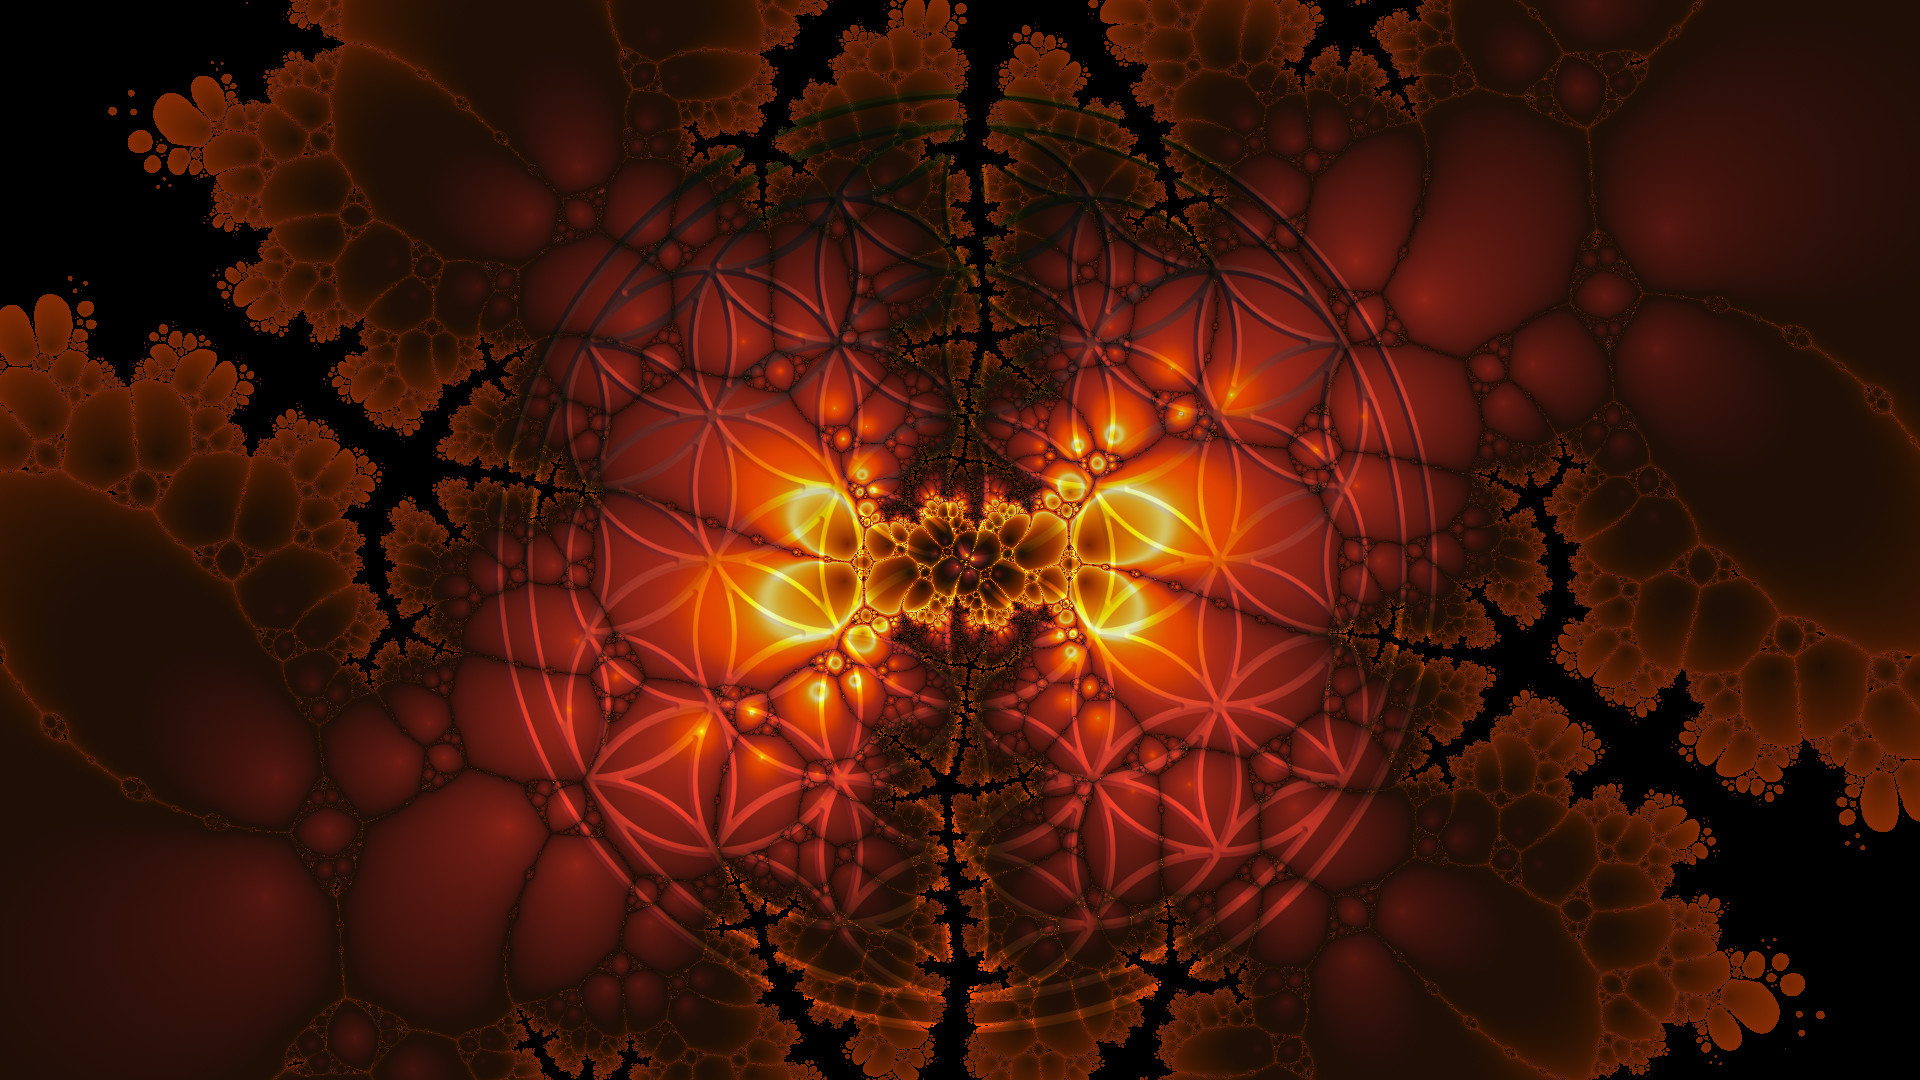 … flower of life screen saver hd 1080 x 1920 by zeneteru